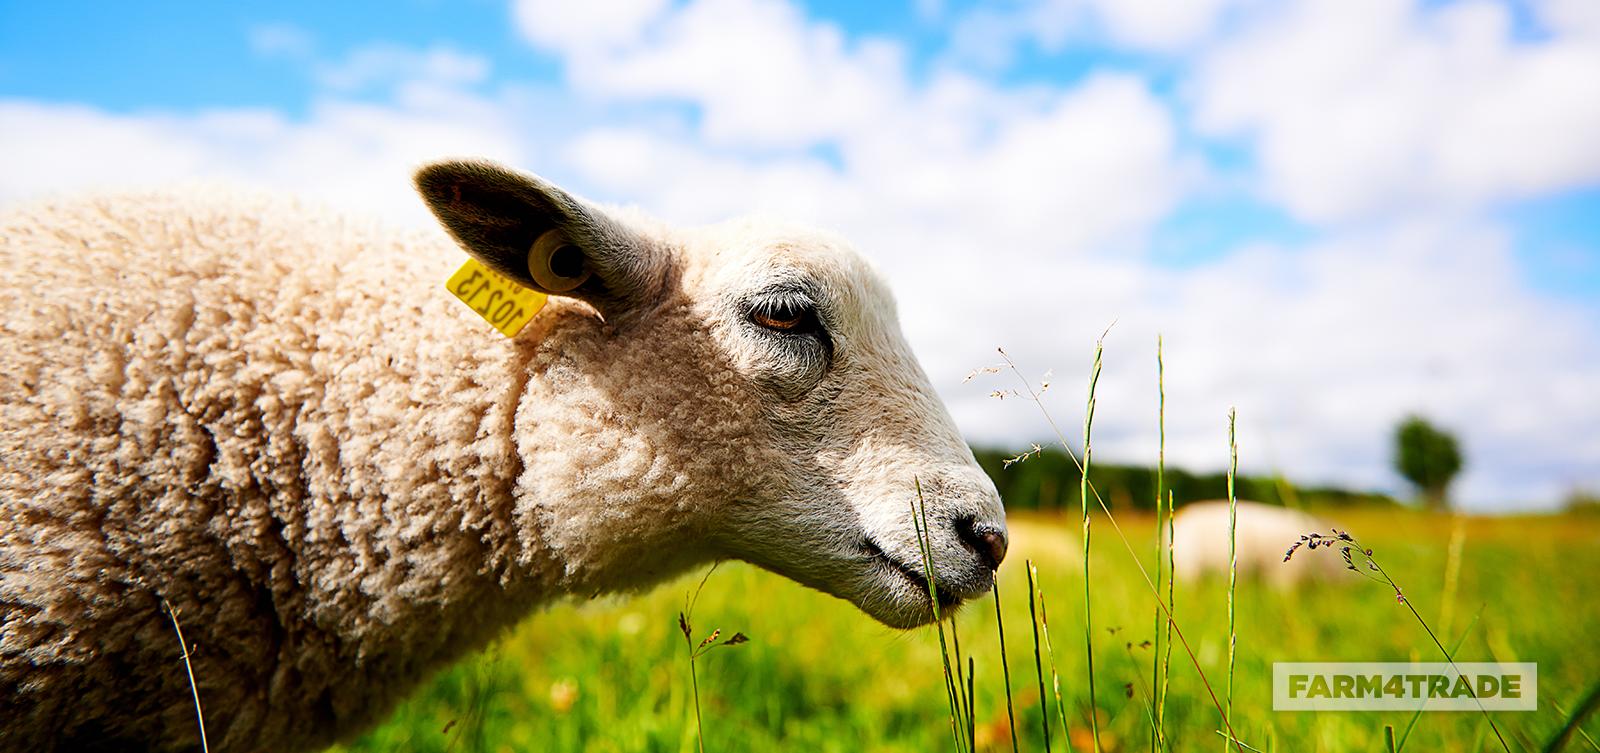 Different methods of animal identification - Blog Farm4Trade